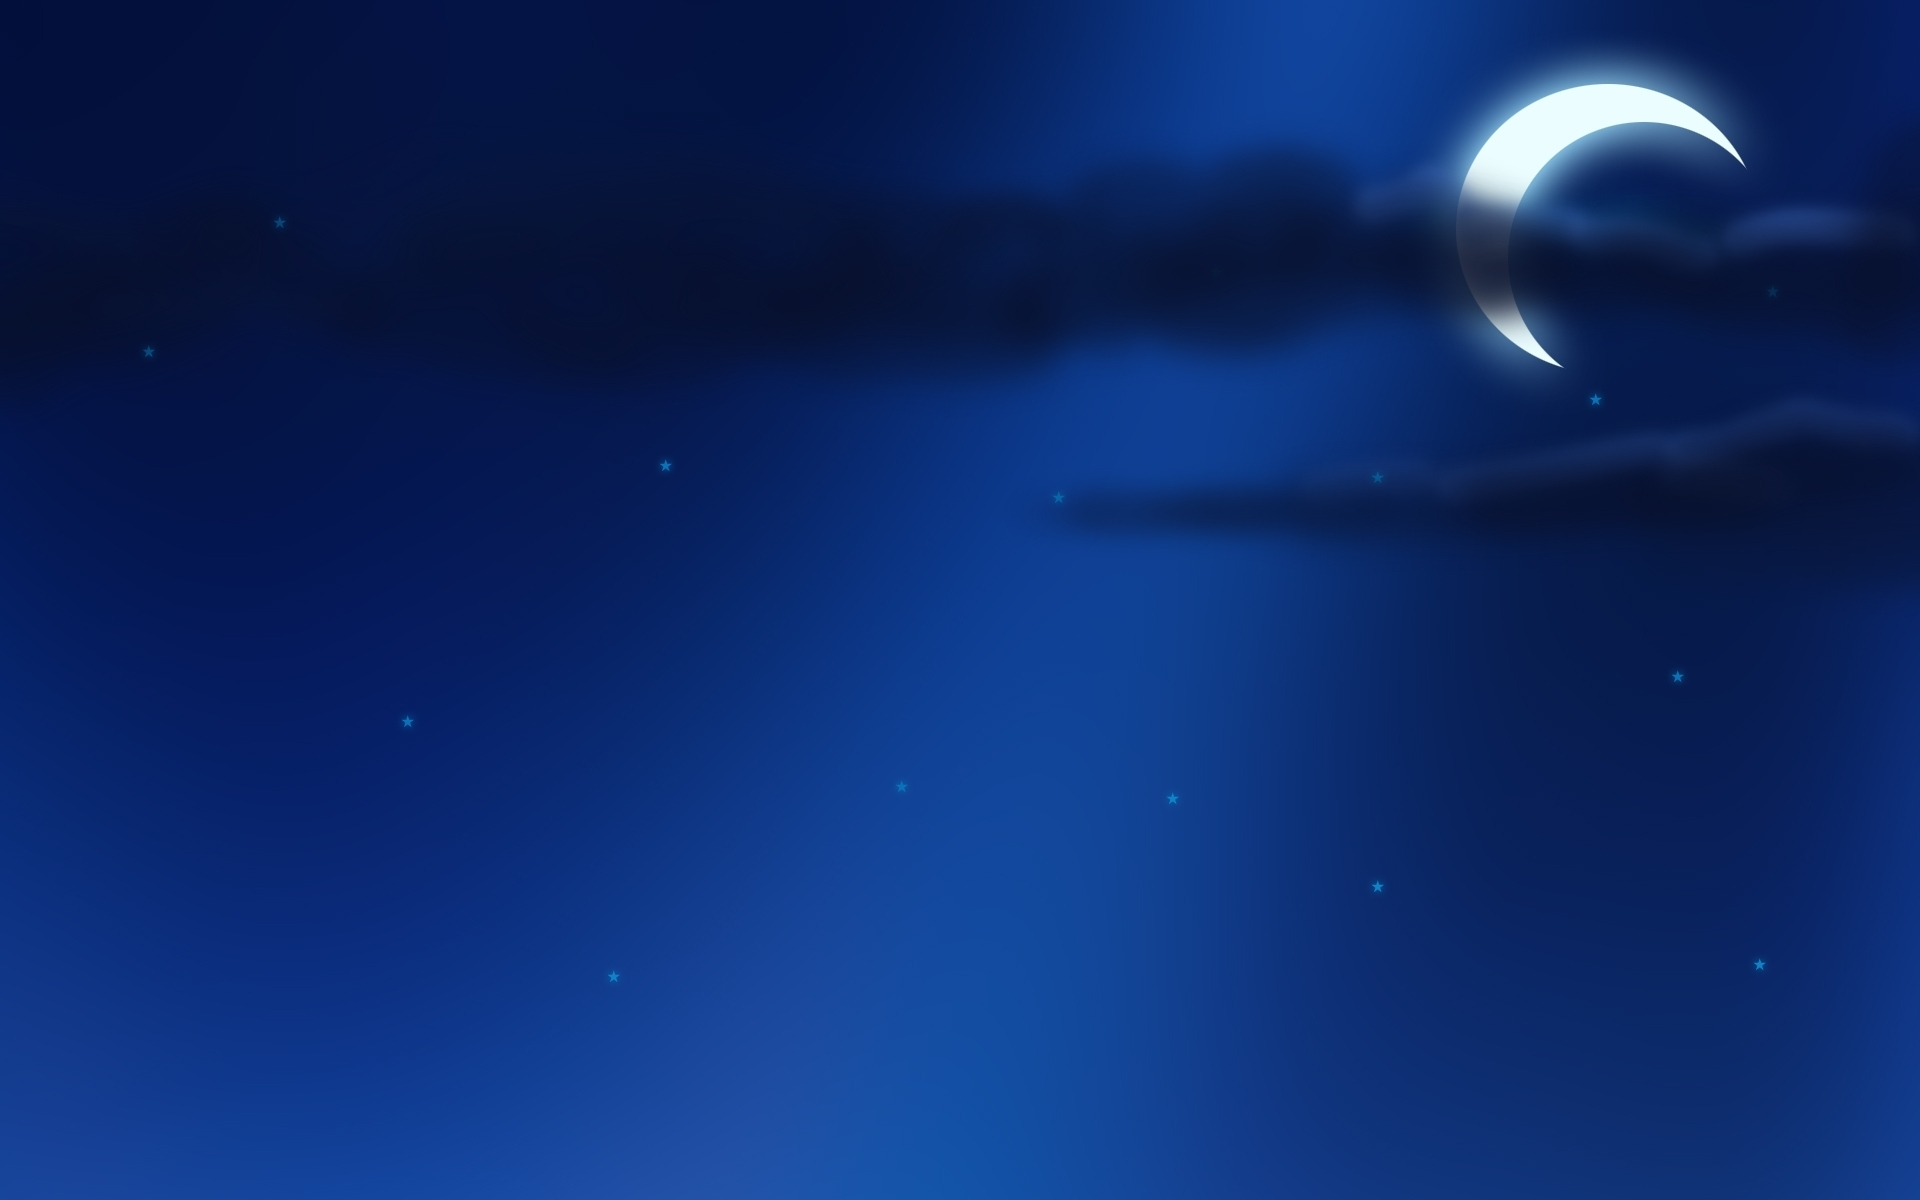 Фон ночь картинка